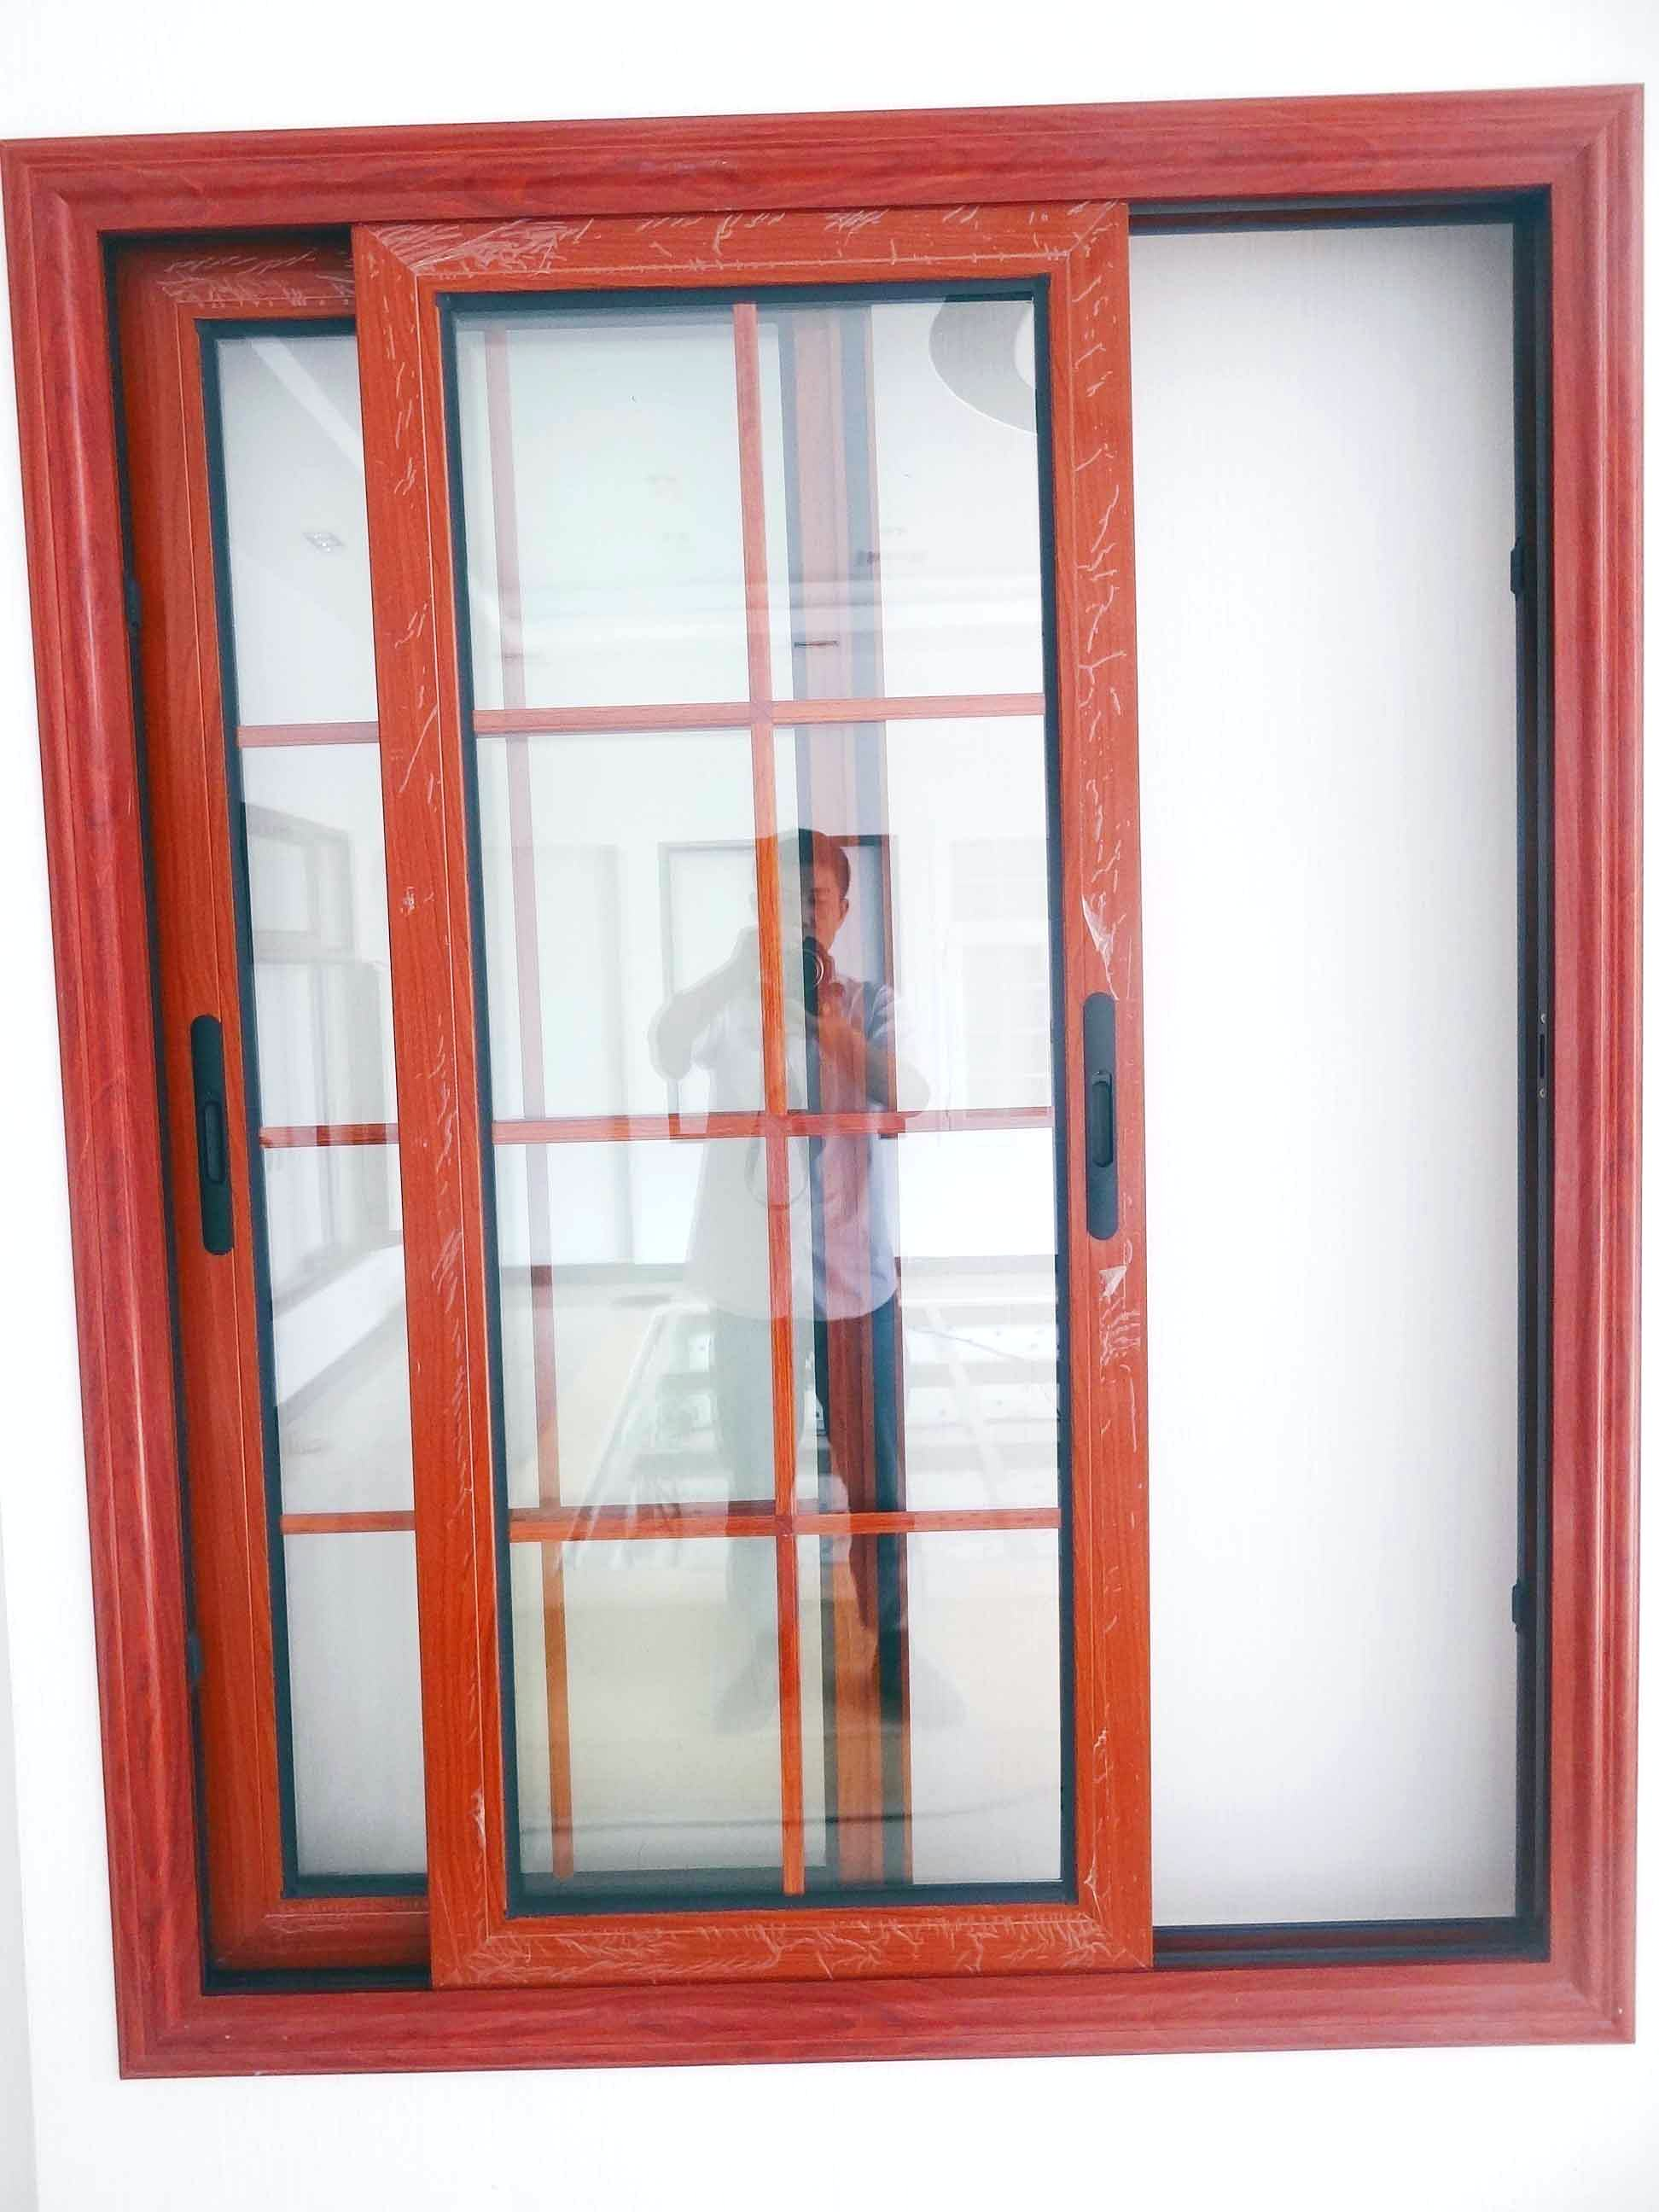 Sliding Glass Windows : Model kusen jendela kamar tidur minimalis terbaru